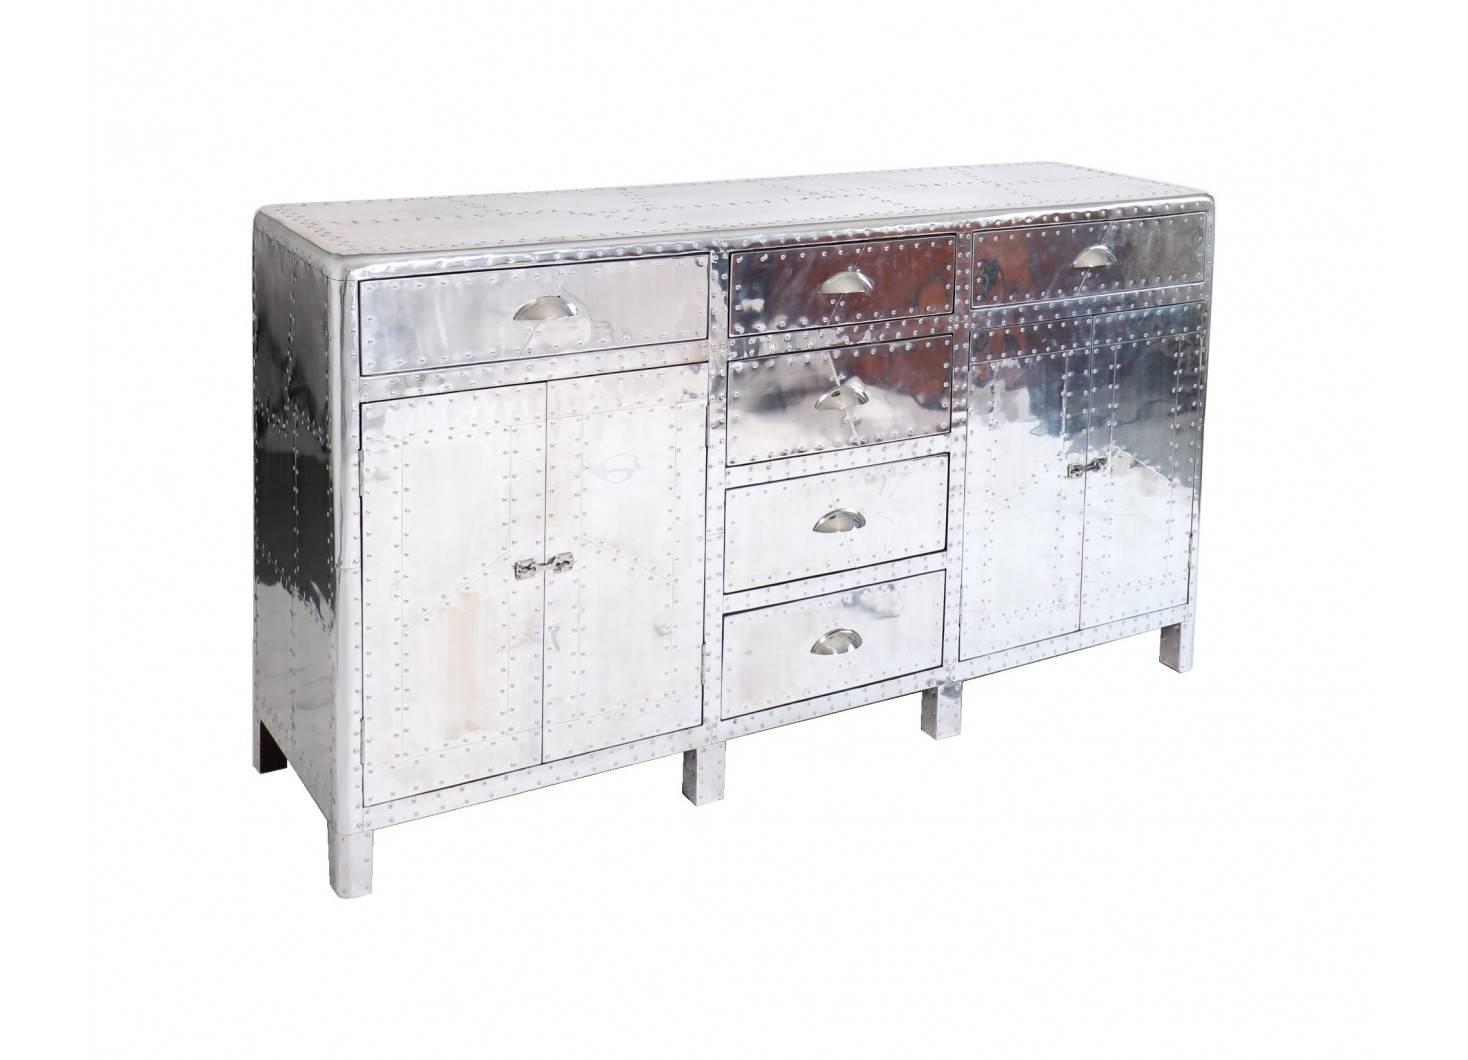 DC3 Sideboard in aluminium